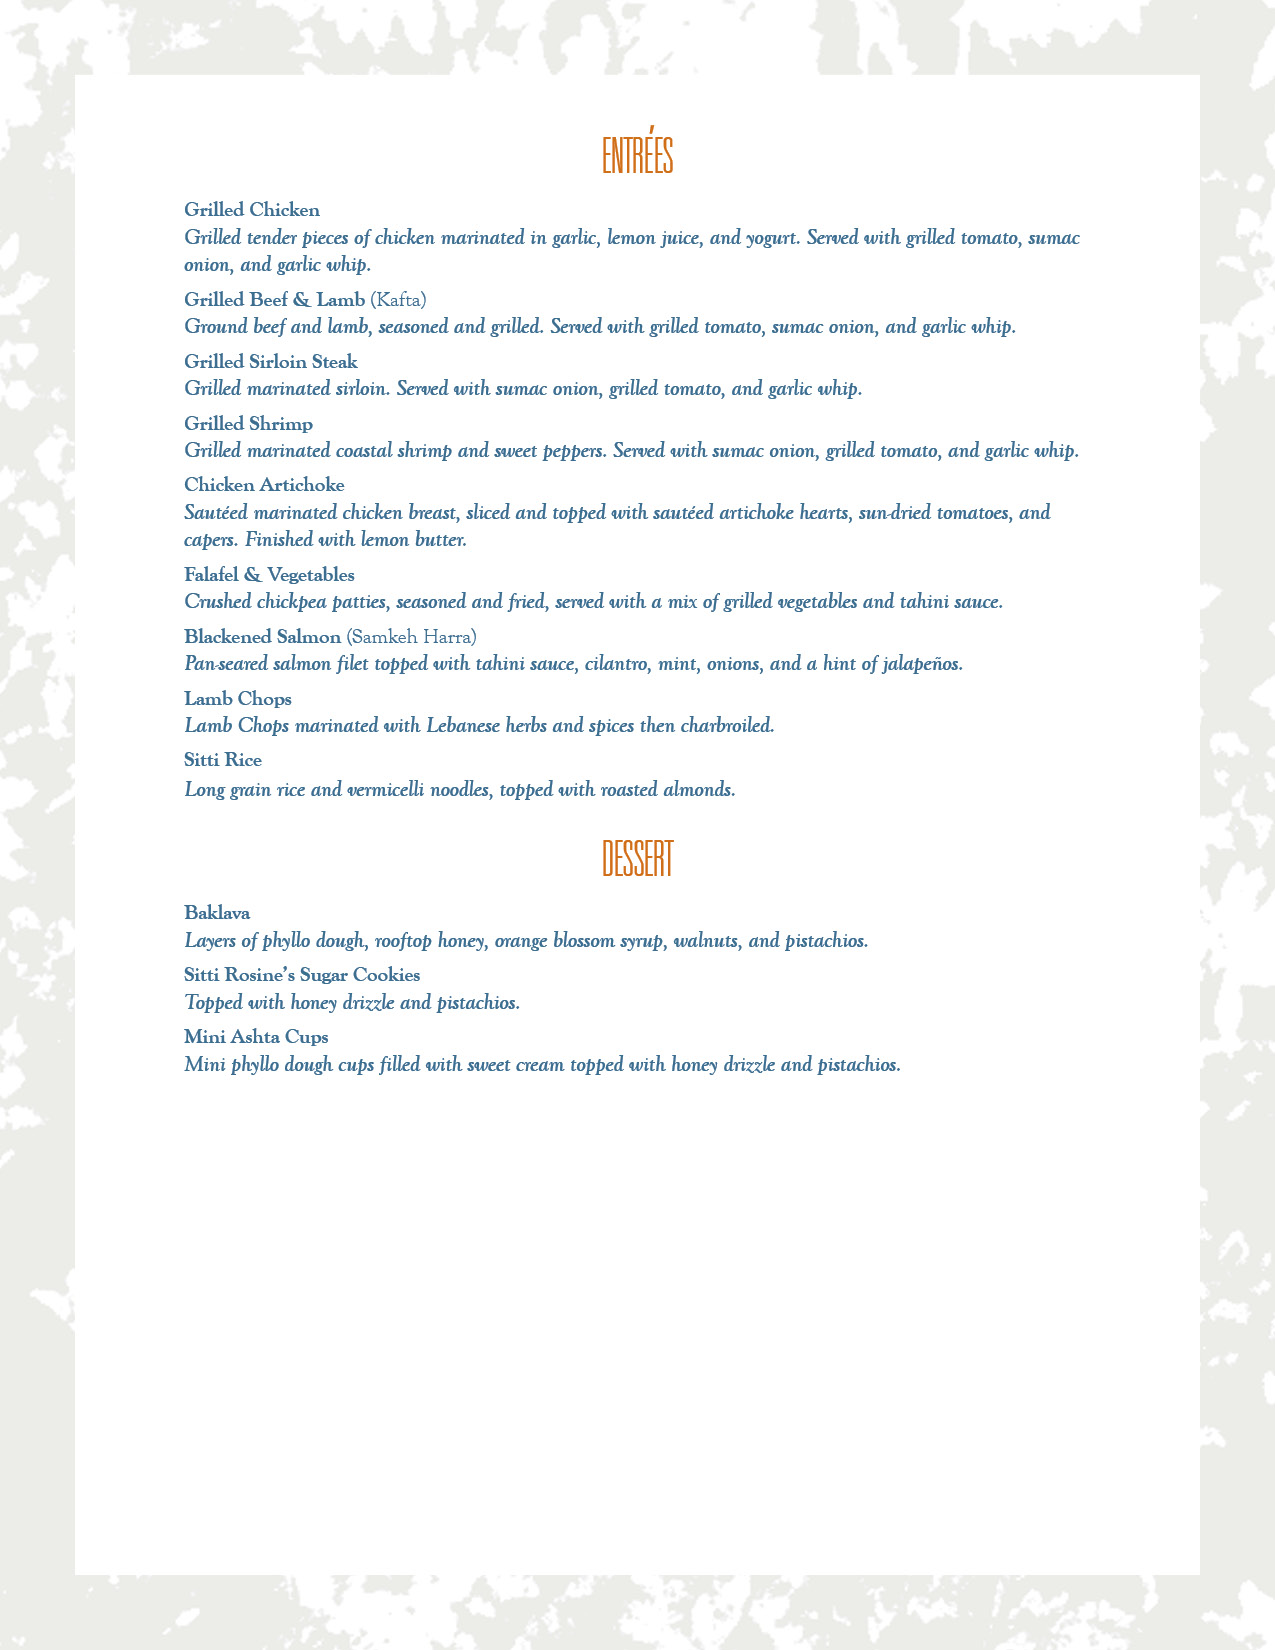 sitti menu descriptions 2